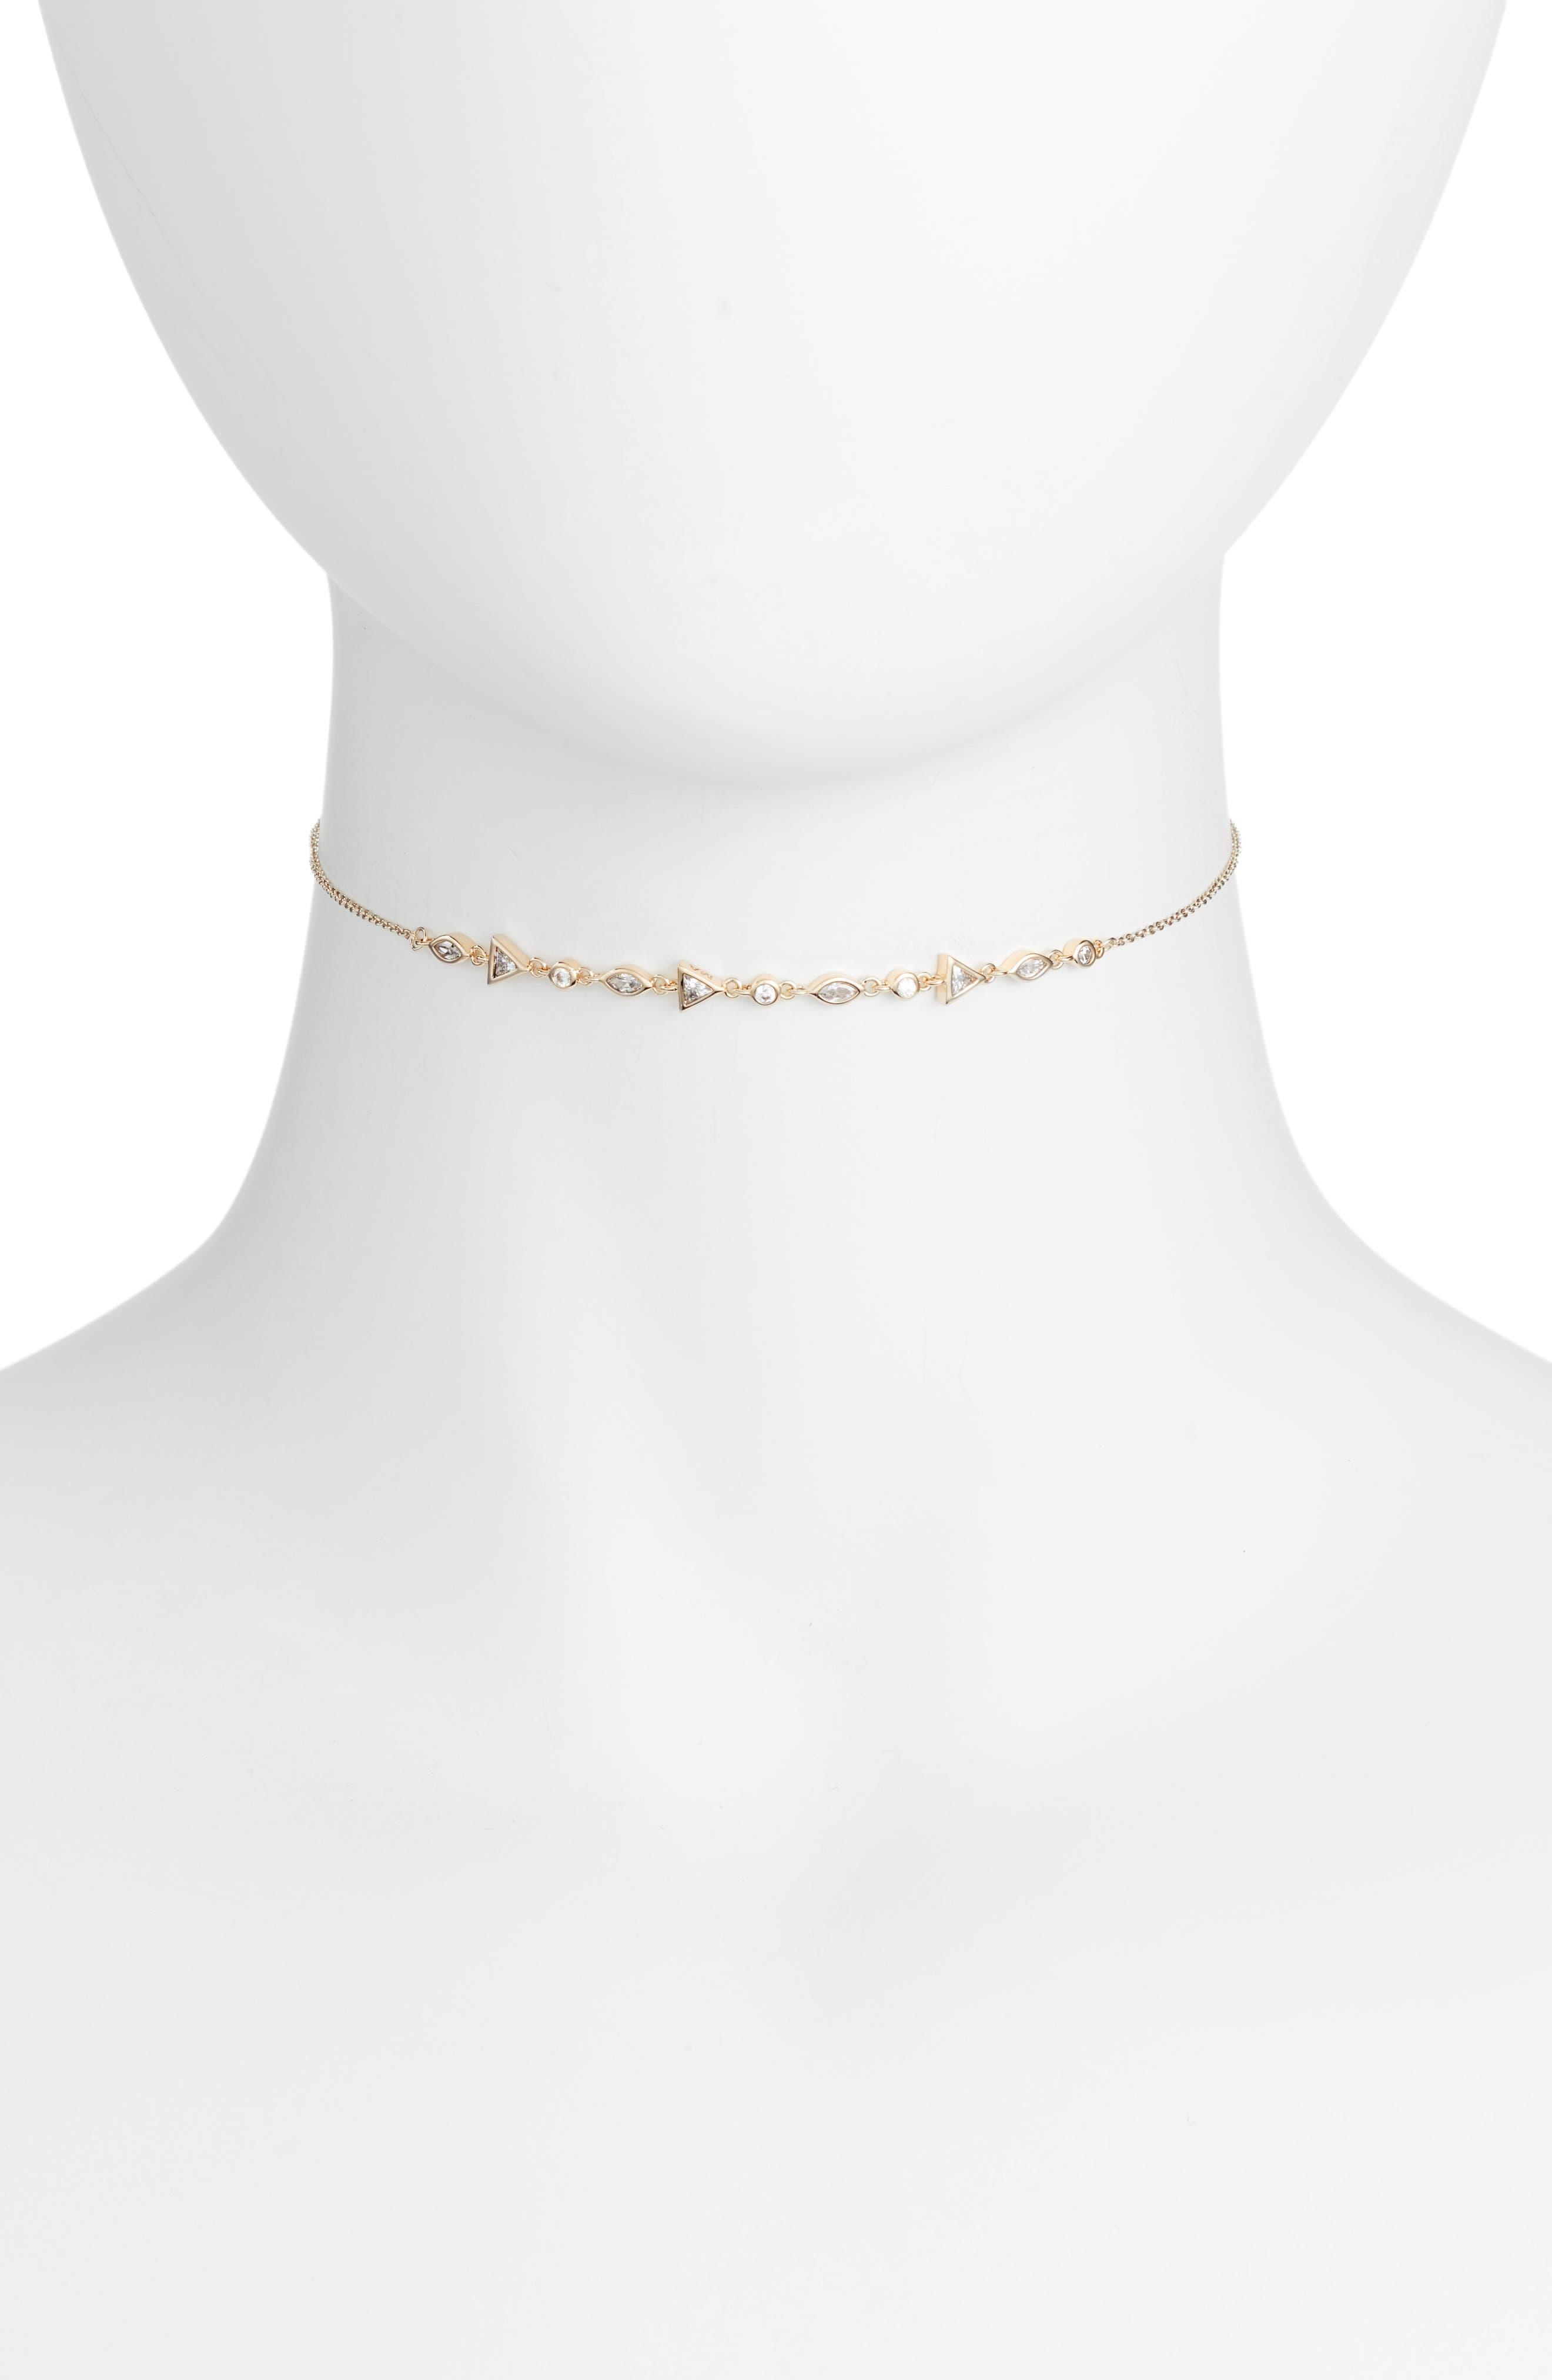 Melanie Auld Zio Geo Choker Necklace